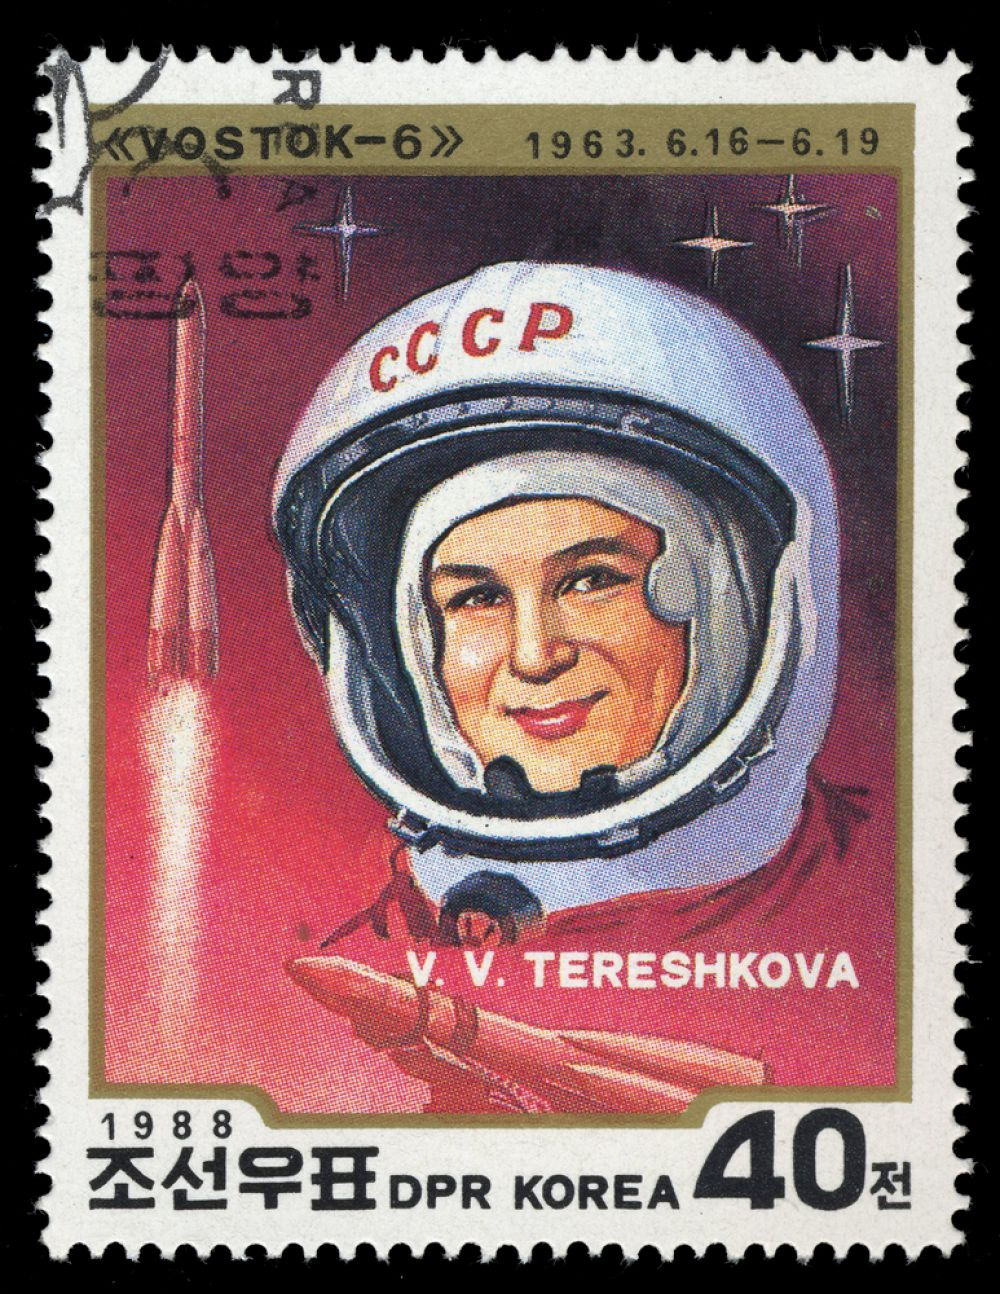 Почтовая марка КНДР, 1988 год.